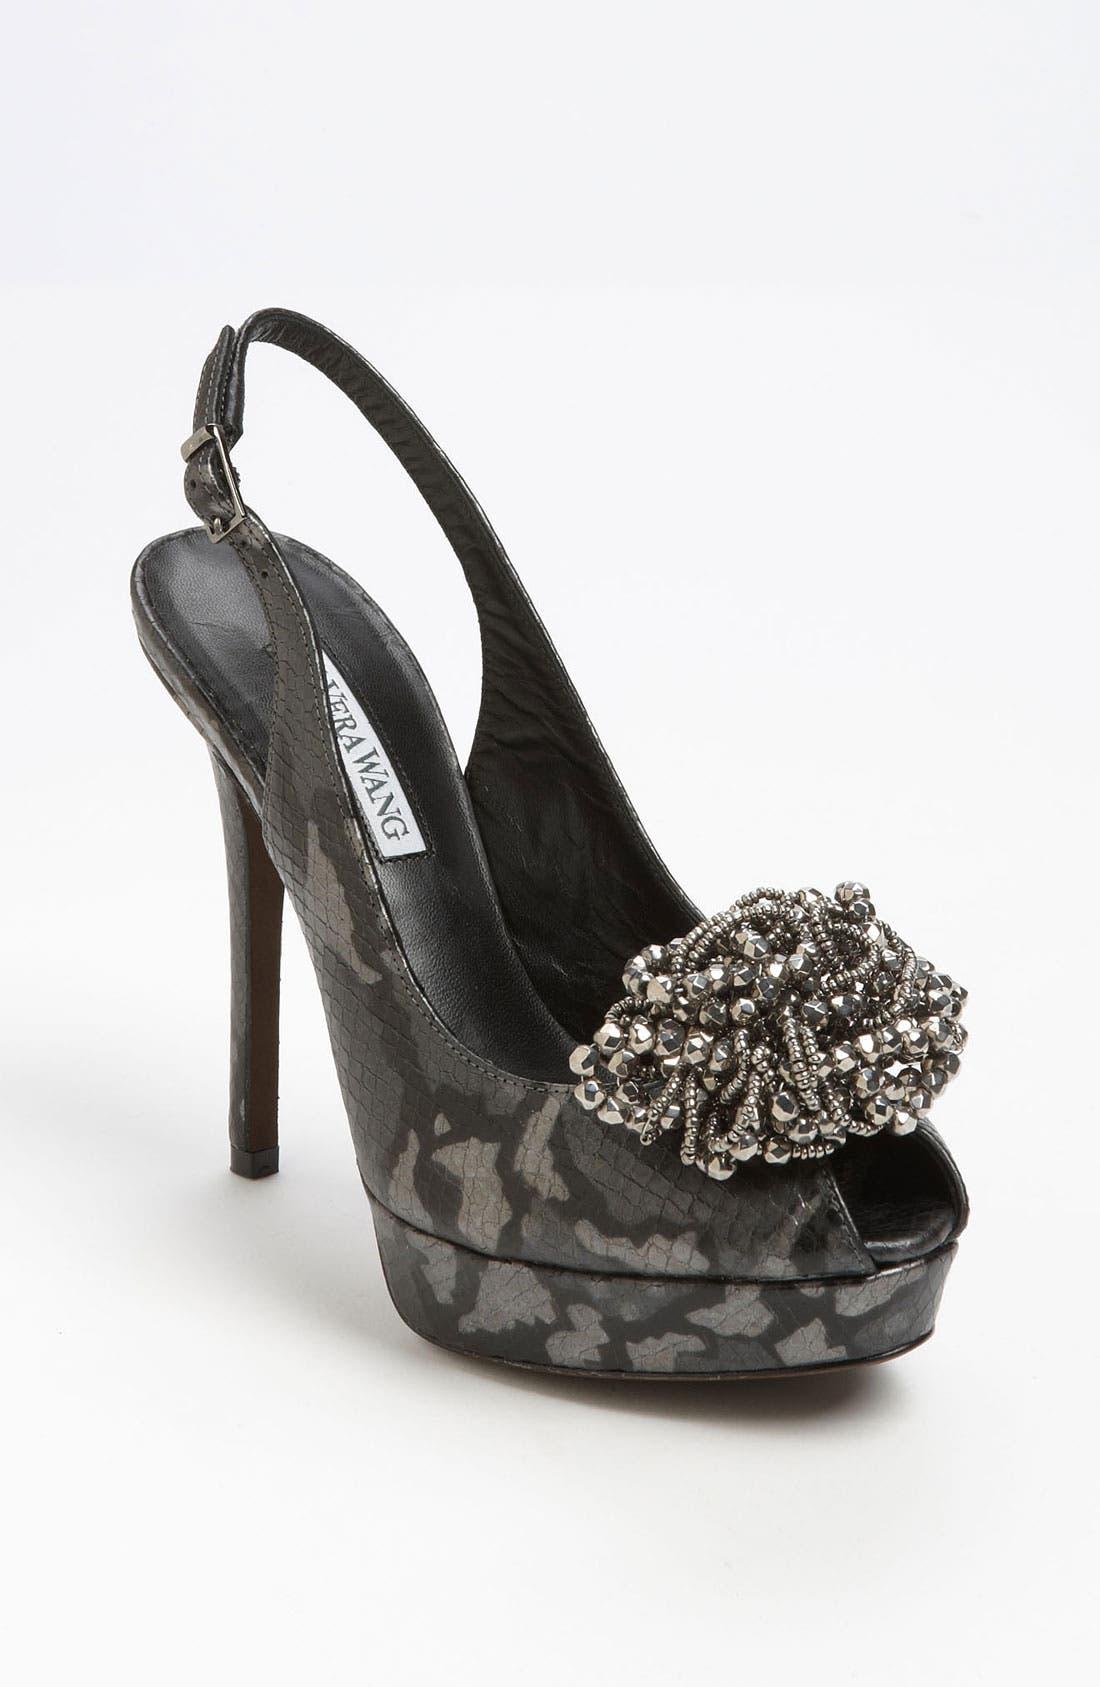 Main Image - Vera Wang Footwear 'Melody' Pump